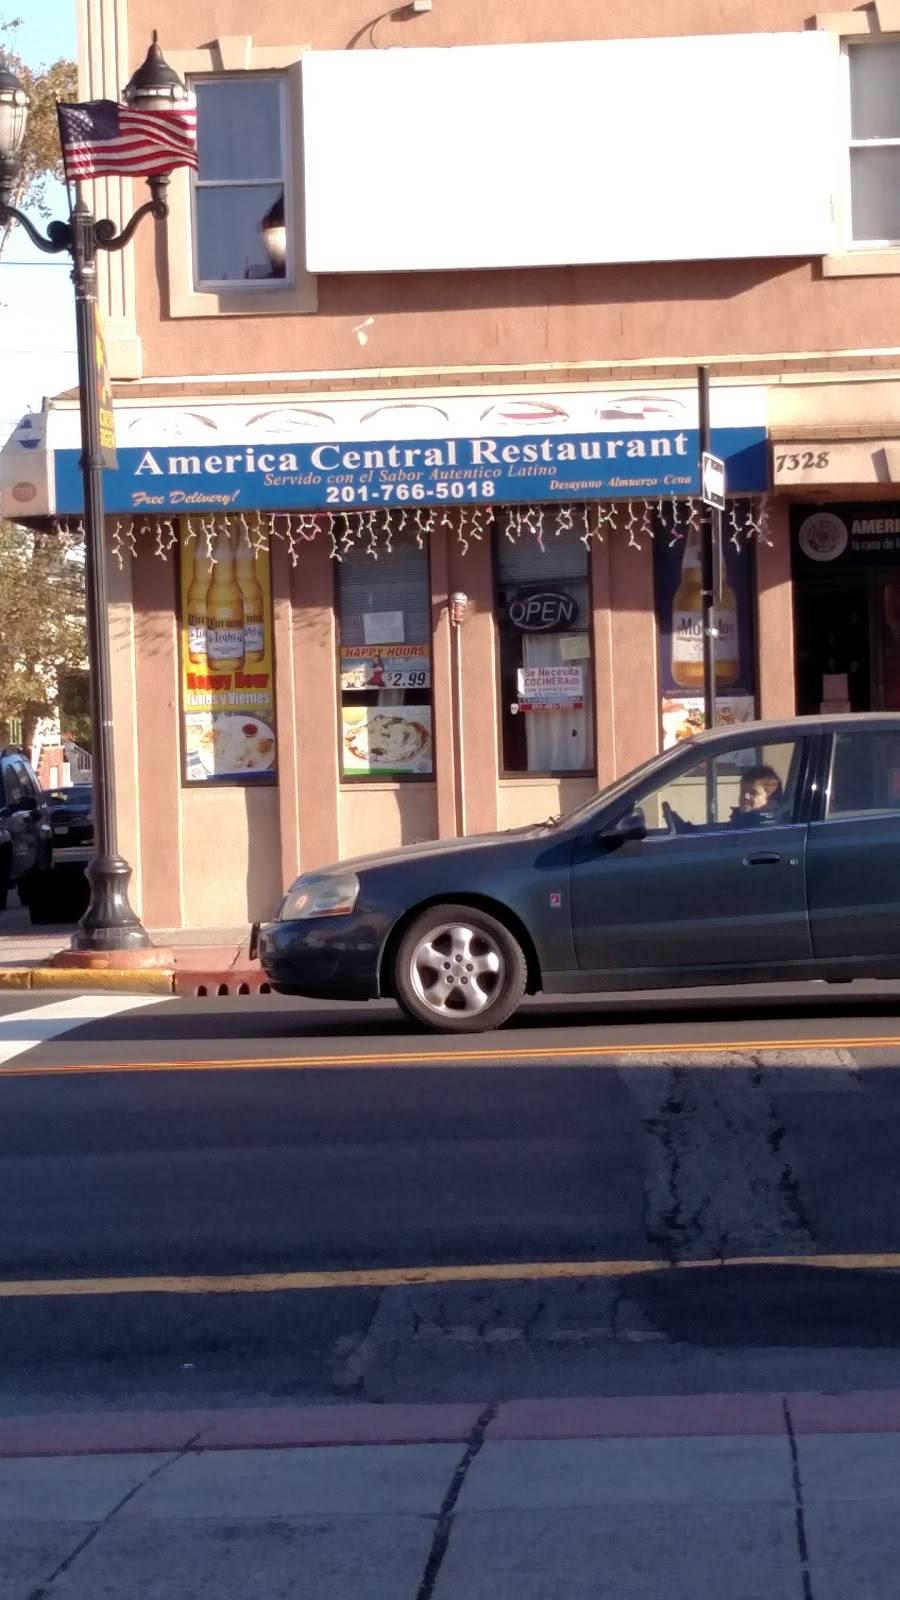 America Central Restaurant | restaurant | 7328 Bergenline Ave, North Bergen, NJ 07047, USA | 2017665018 OR +1 201-766-5018